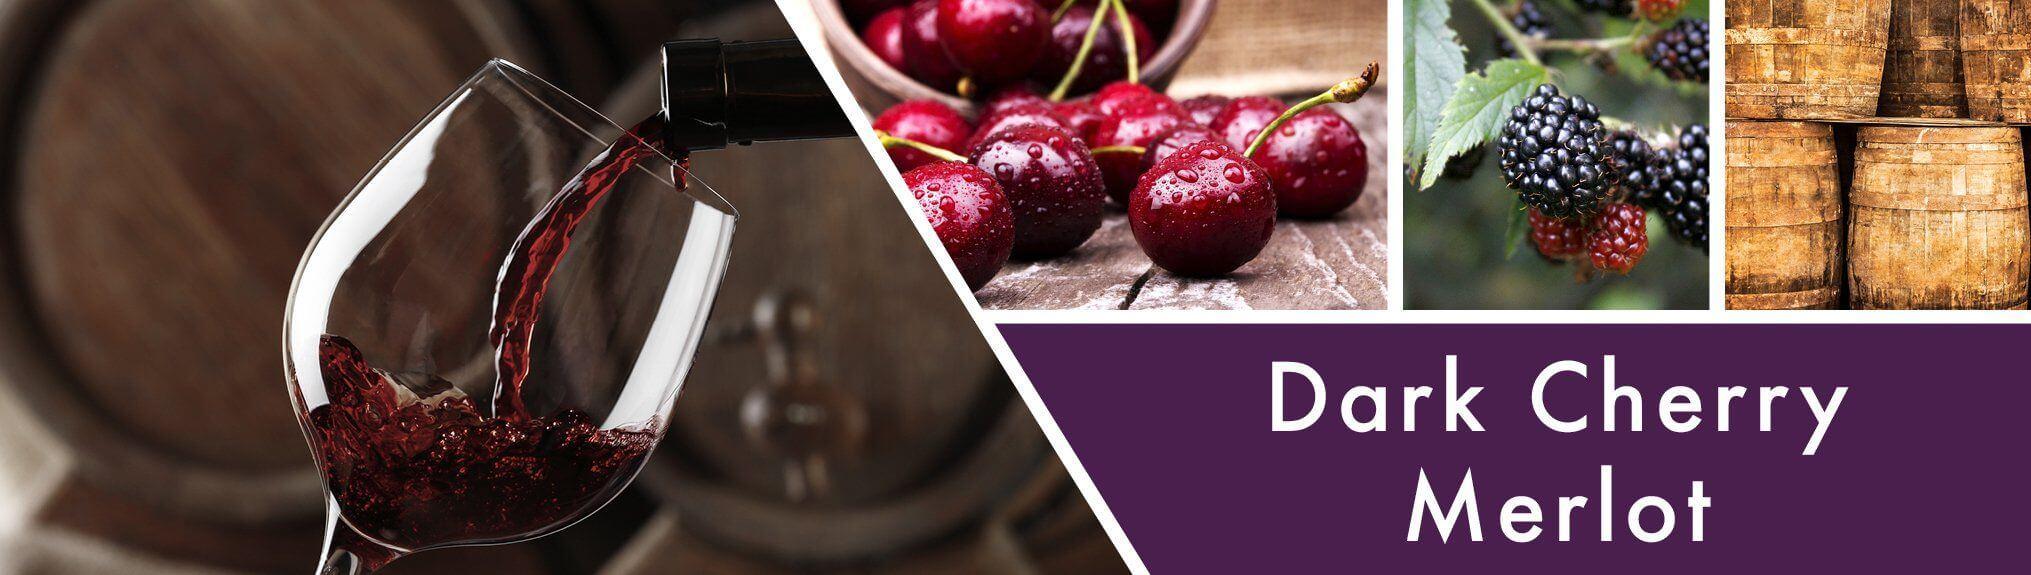 Goose-Creek-Candle-dark-cherry-merlot-candle-Duftbeschreibung